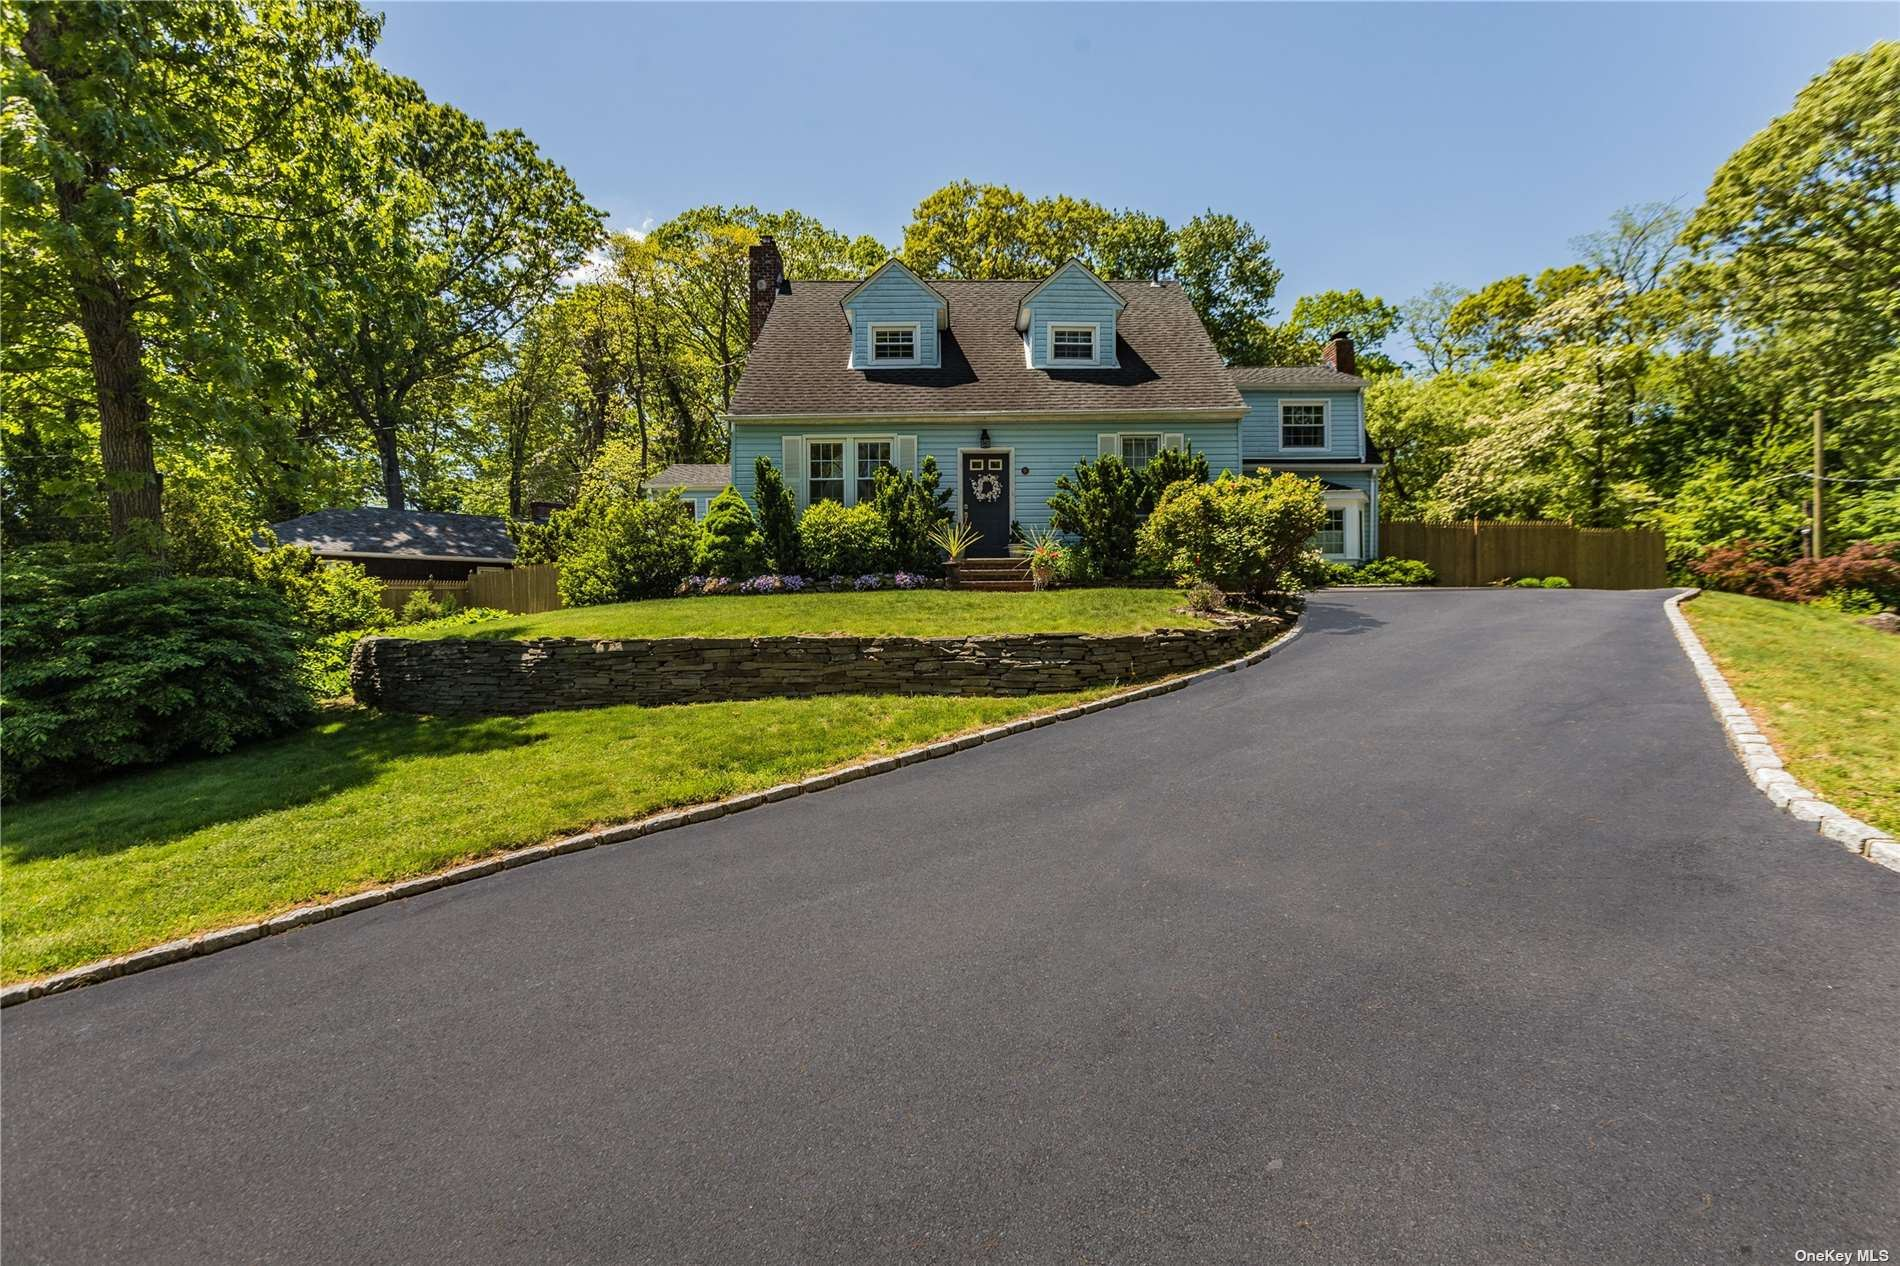 16 Cottage Court, Huntington Station, NY 11746 - MLS#: 3314364